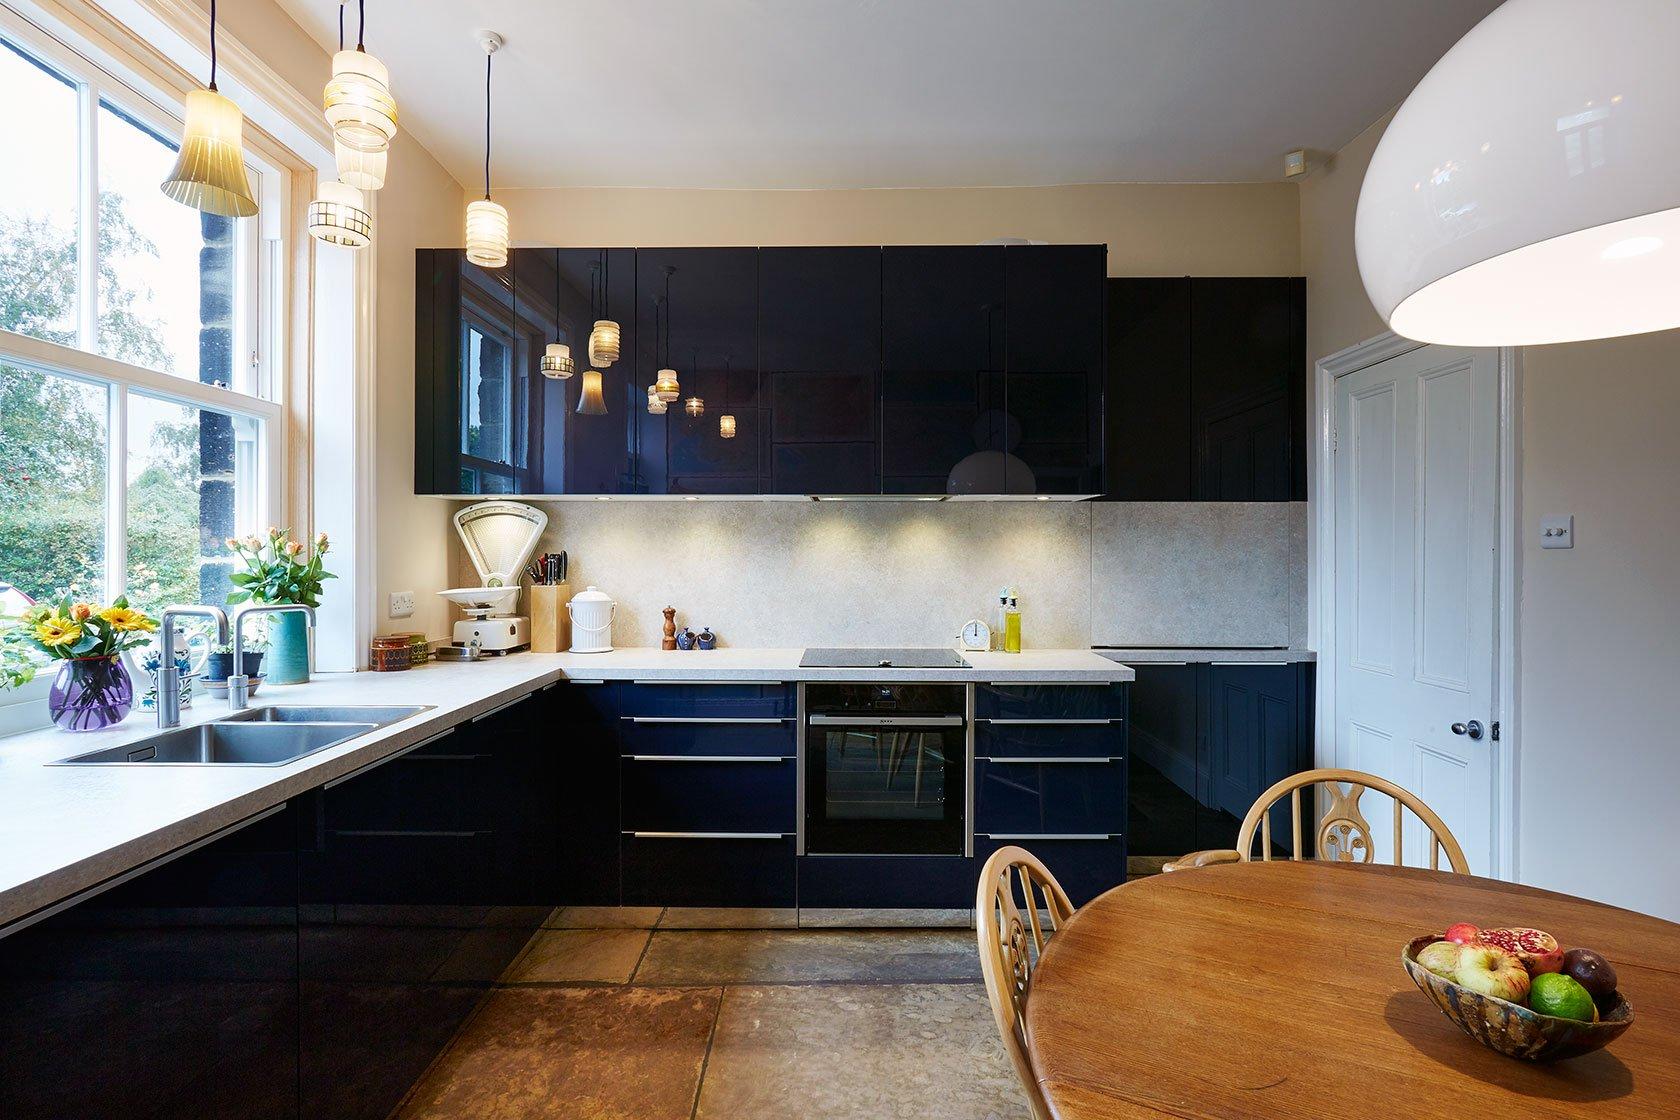 Horsforth-leeds-kitchen-ls18-gallery-4